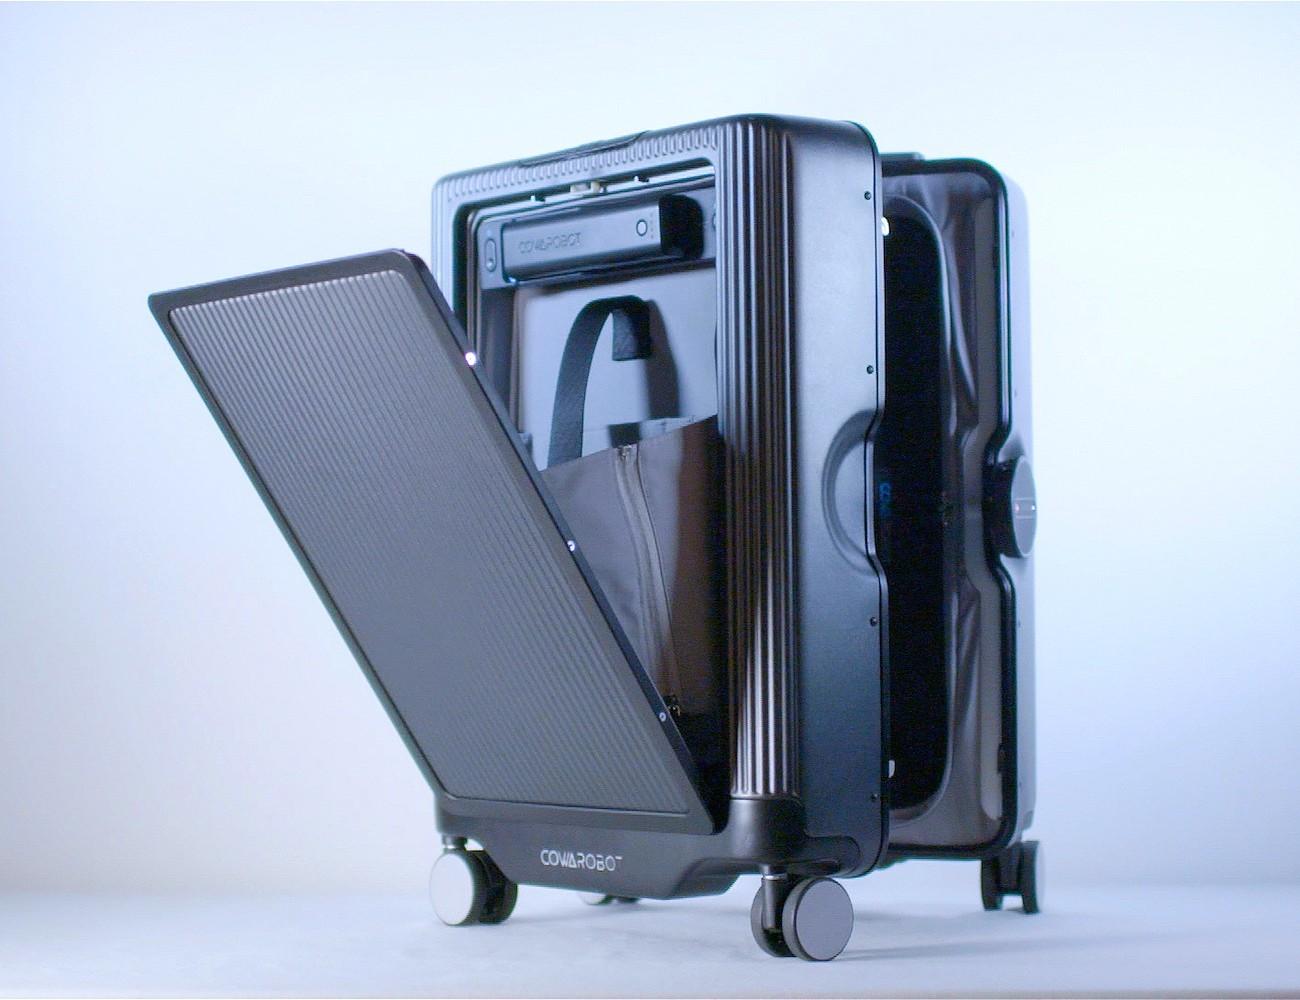 Auto-Follow Suitcase Makes Your Travel Easier – COWAROBOT R1